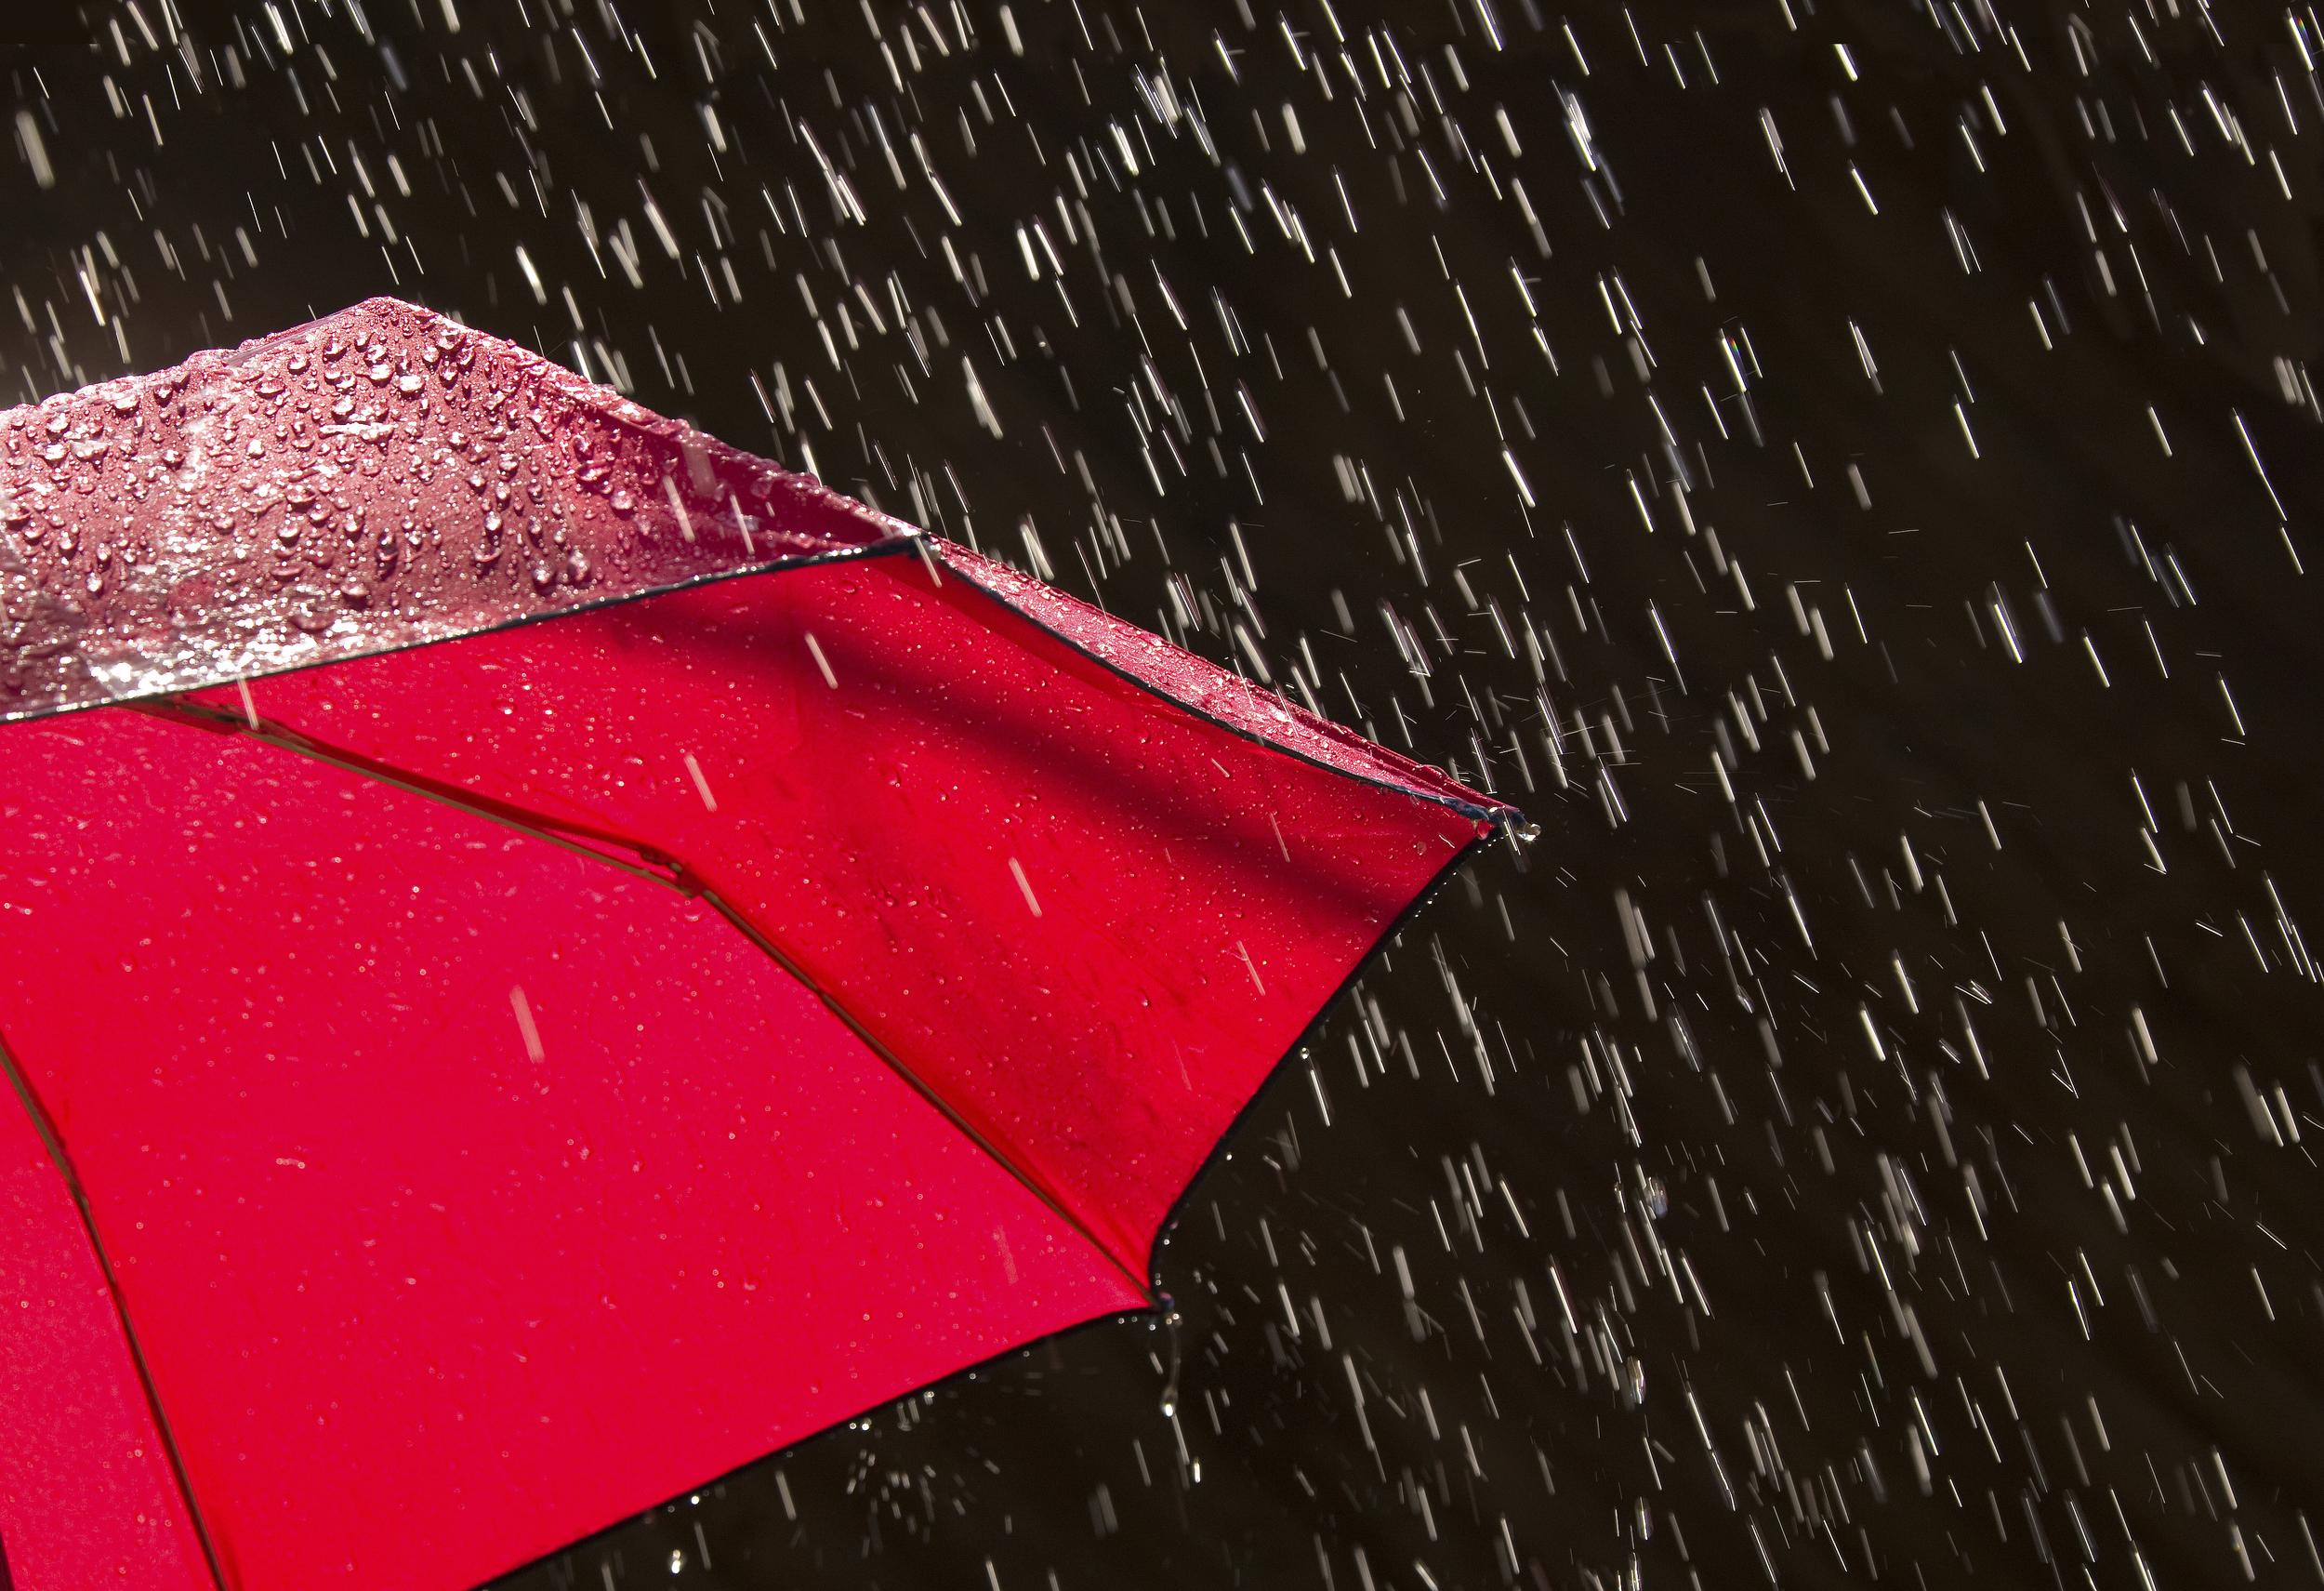 Red umbrella facing pelting rain.